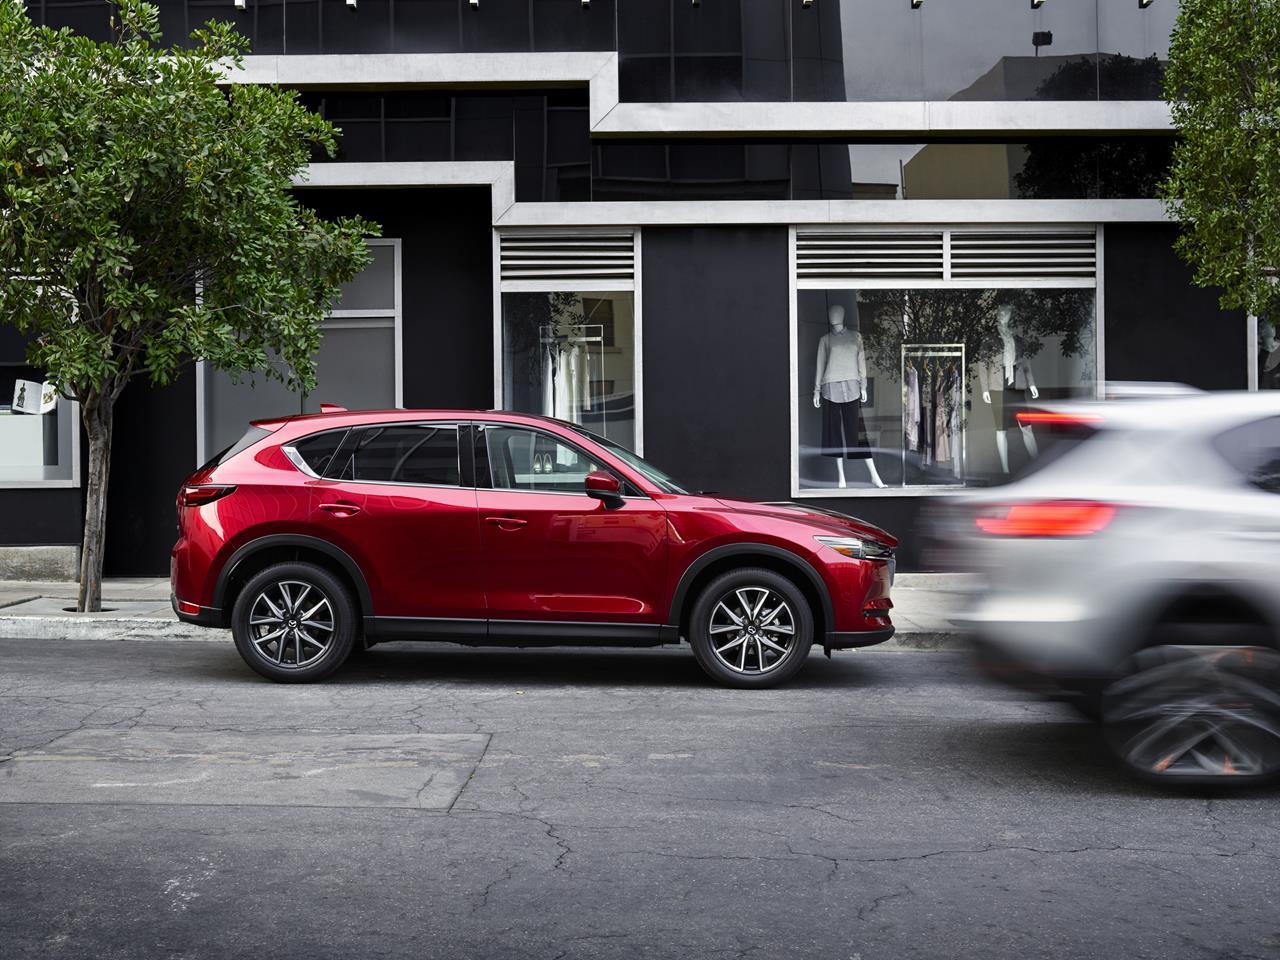 Mazda CX-5 photo 171559